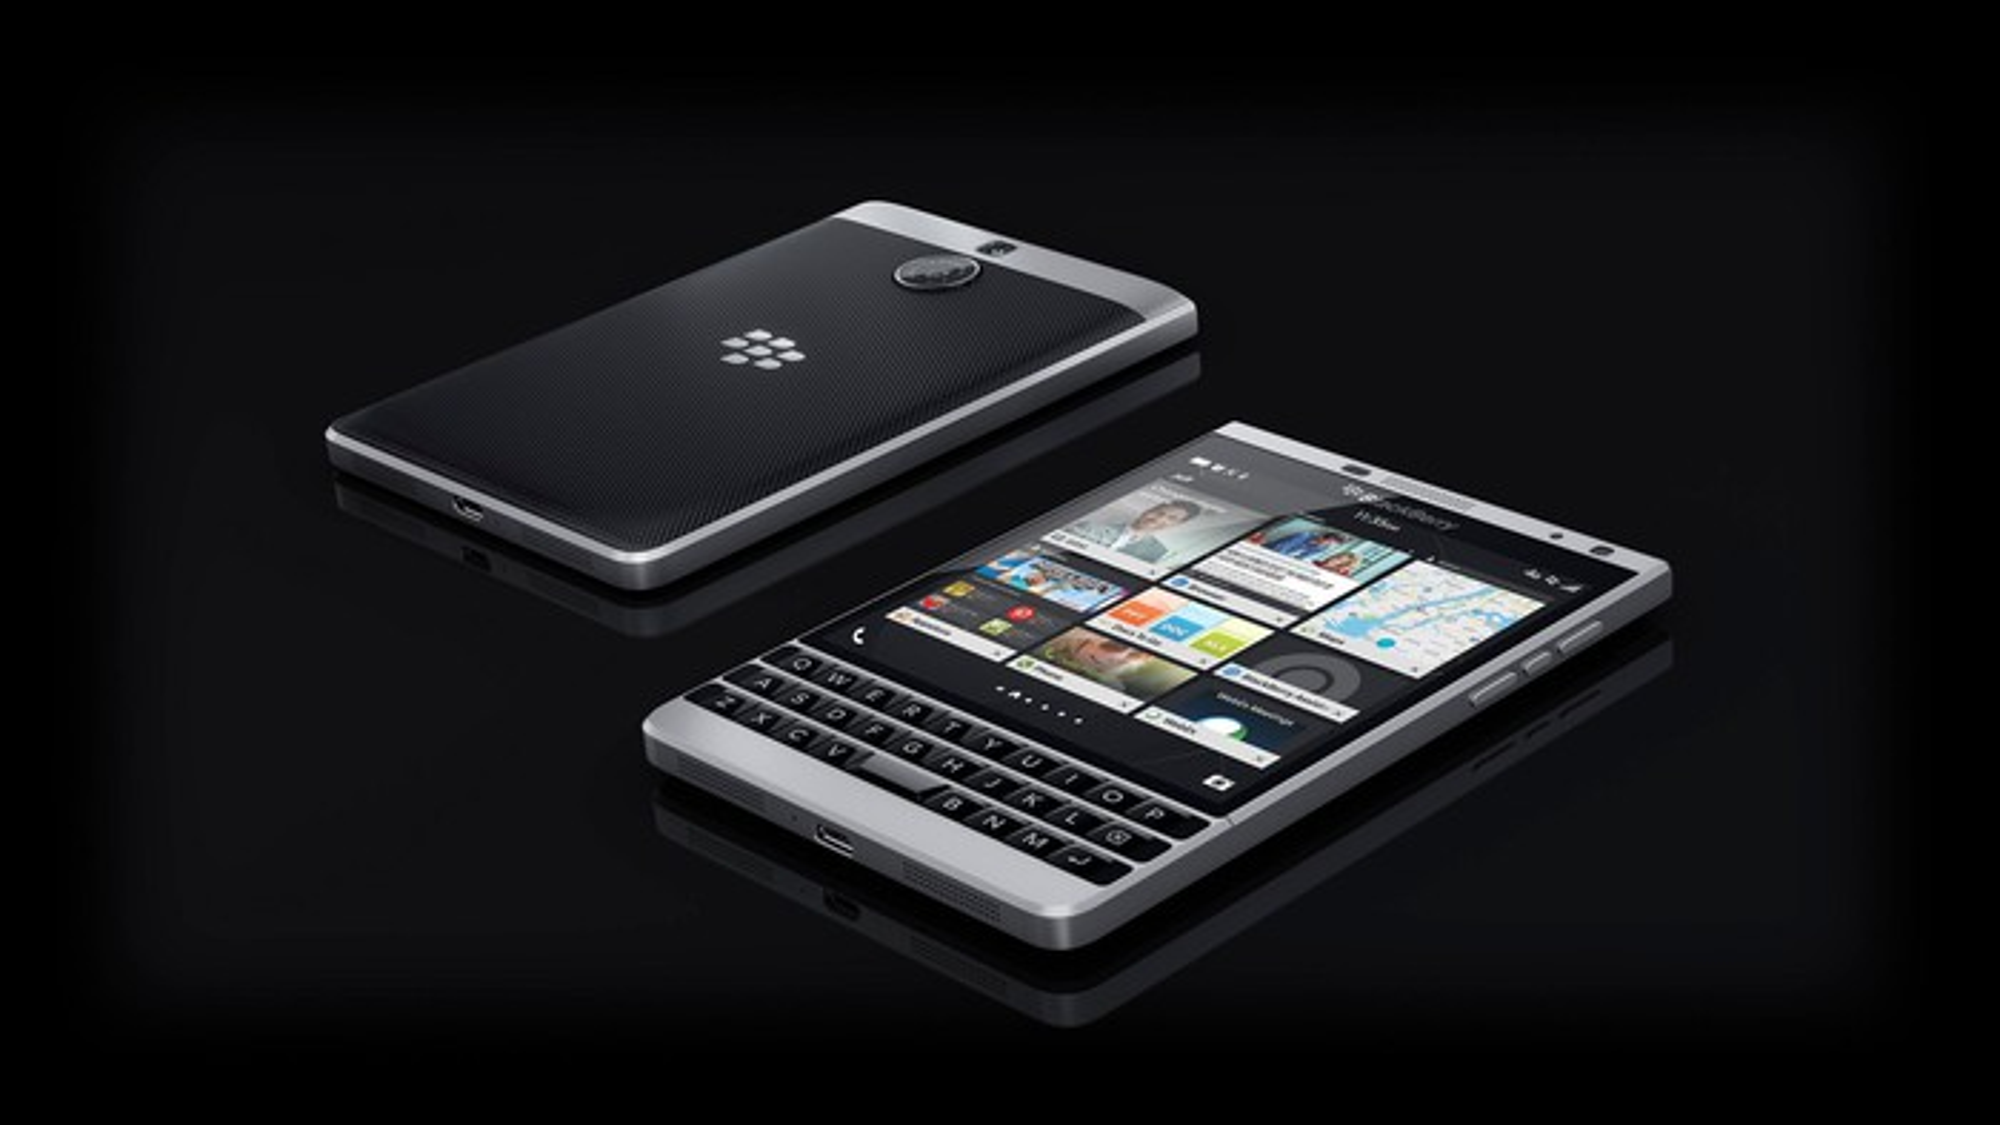 BlackBerry smartphone.